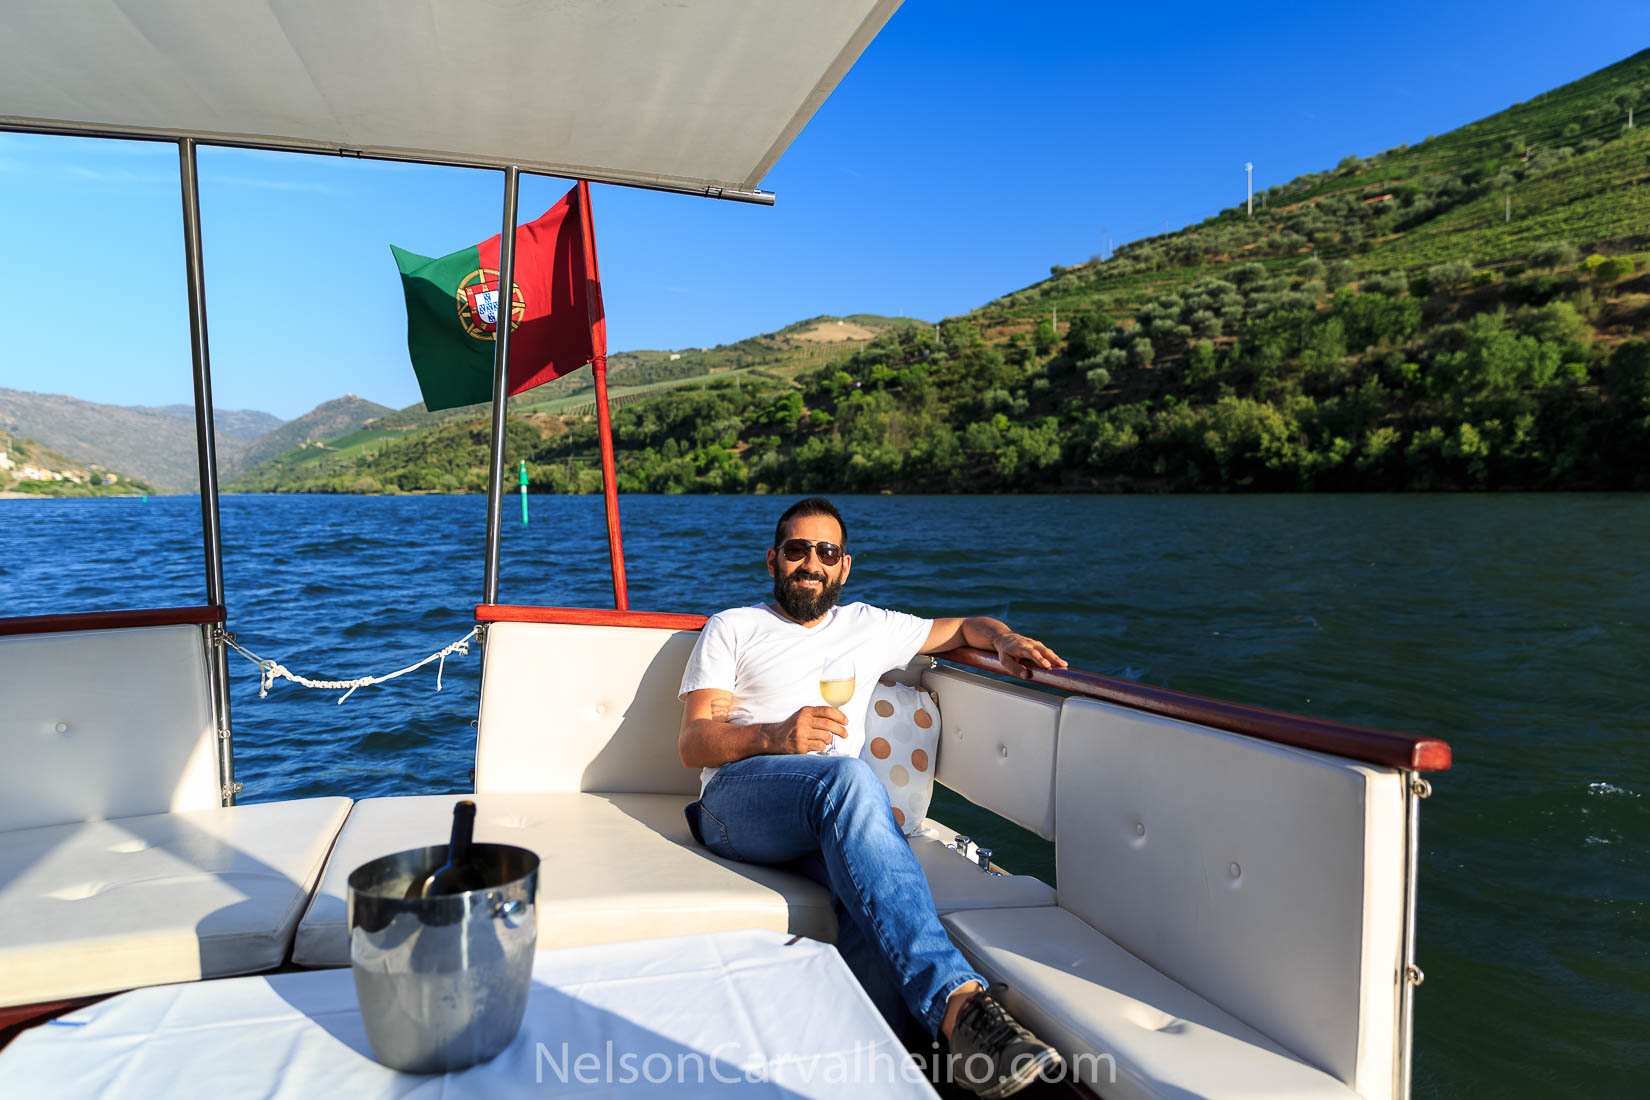 Nelson Carvalheiro Wine Cruise in Douro